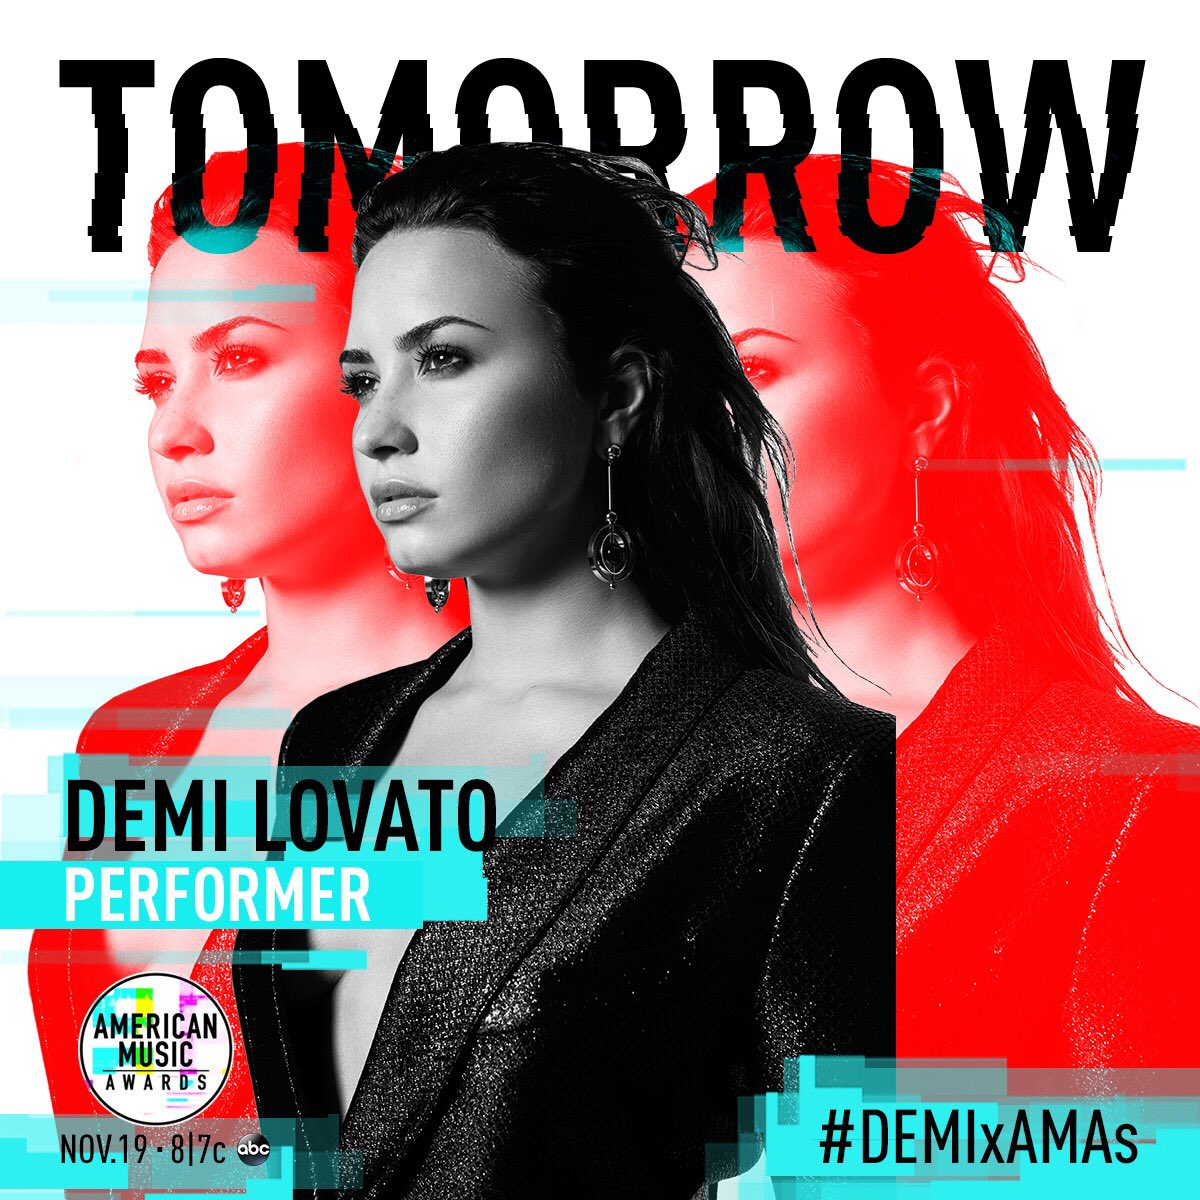 Tomorrow. 8pm ET. @AMAs. You ready?? #SORRYNOTSORRY #DEMIxAMAs https://t.co/ADWmJKbtTr